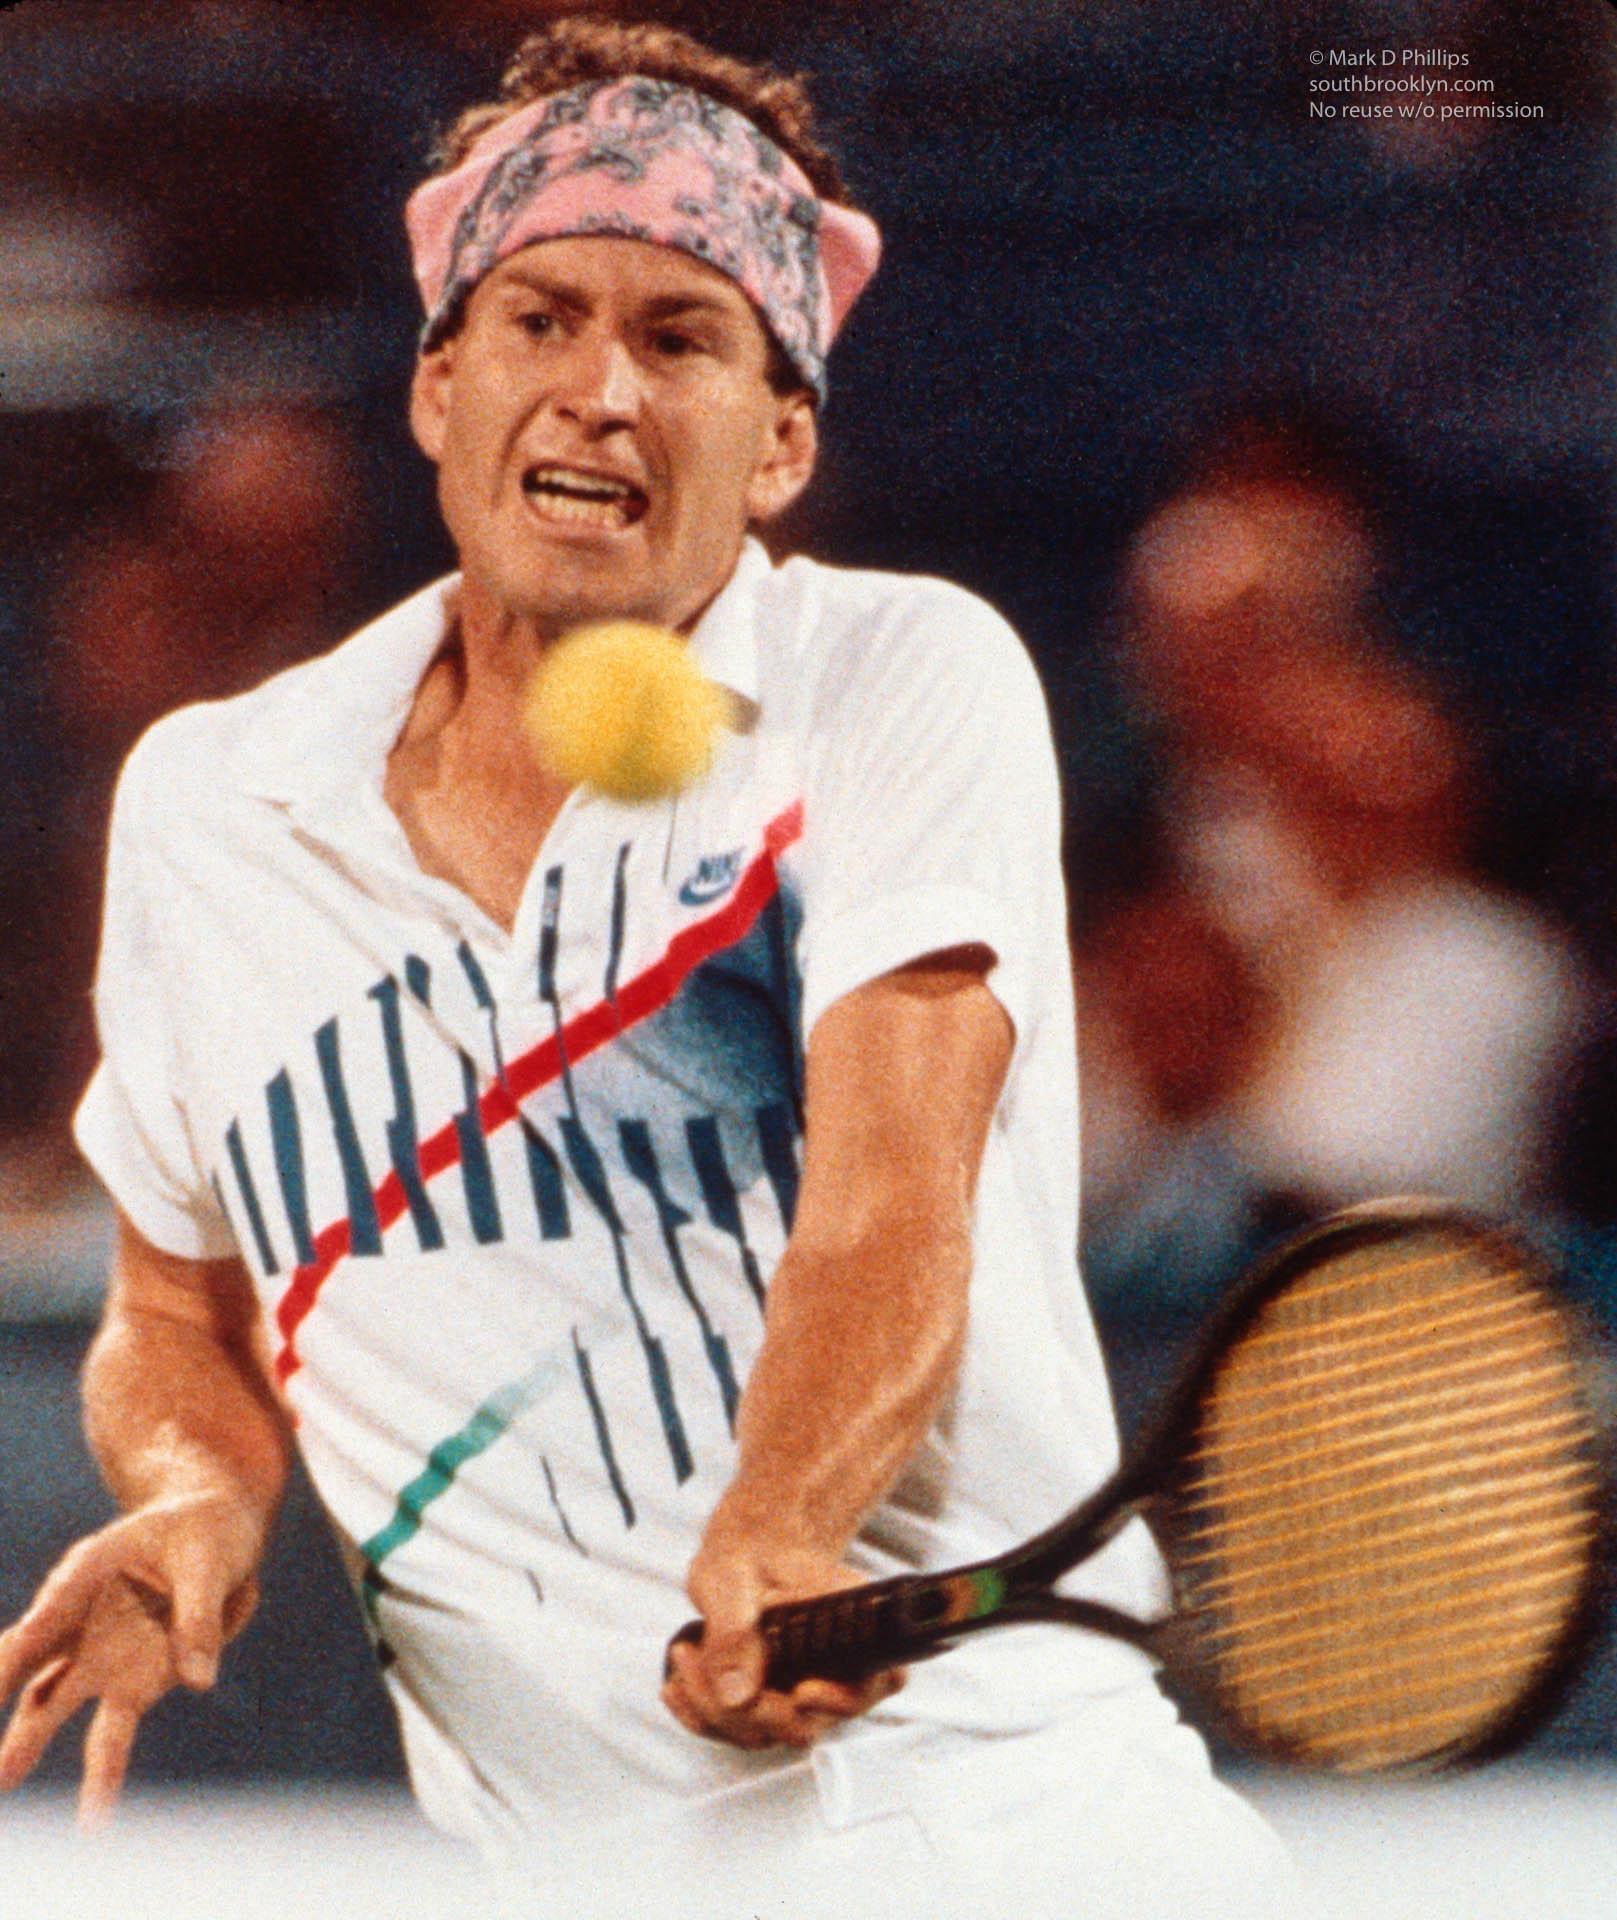 John McEnroe at US Open